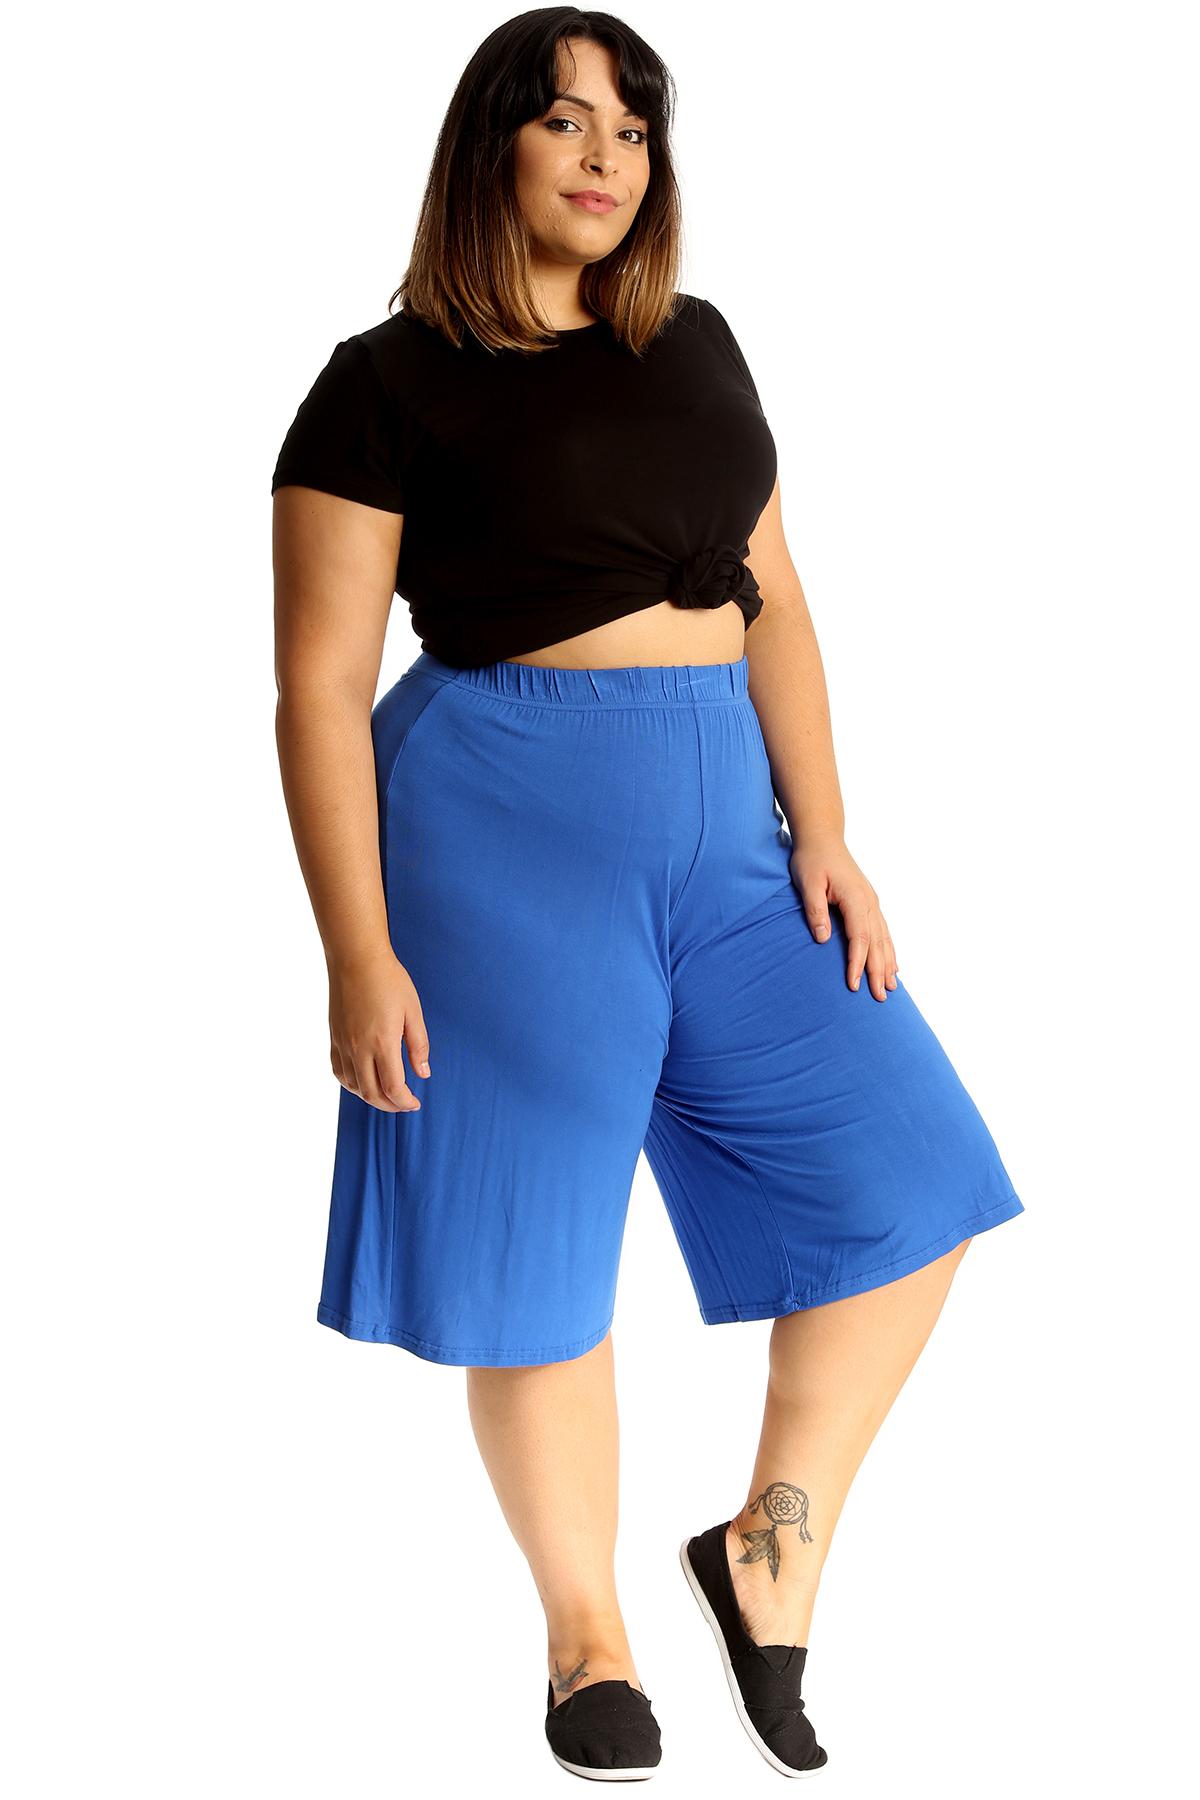 New-Womens-Plus-Size-Culottes-Ladies-Plain-Shorts-Palazzo-Elastic-Pants-Summer thumbnail 47